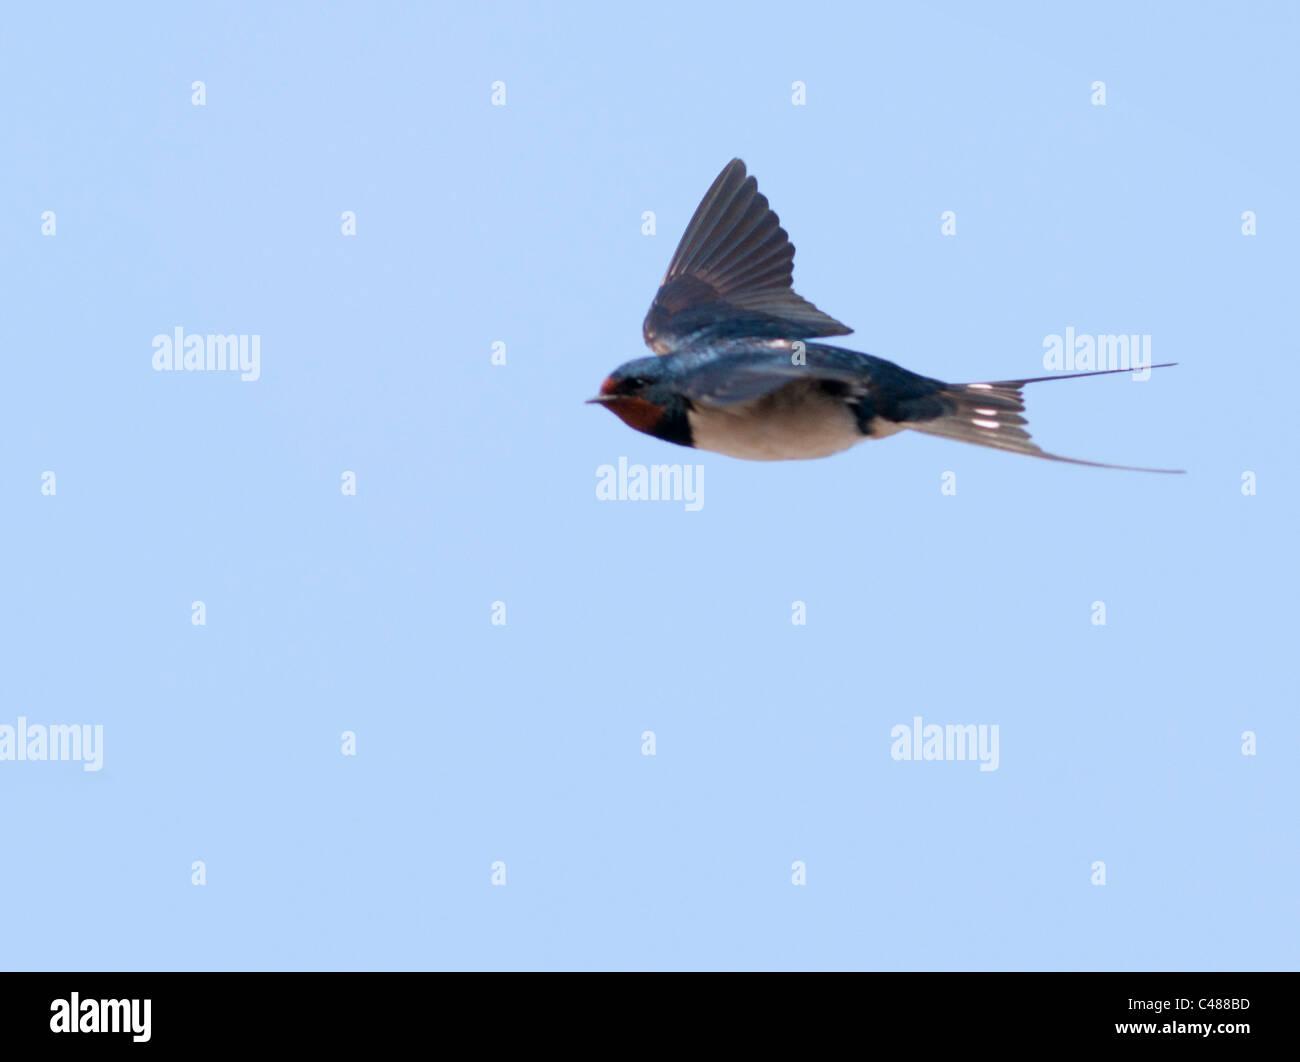 Swallow (Hirundo rustica) in flight against blue sky - Stock Image